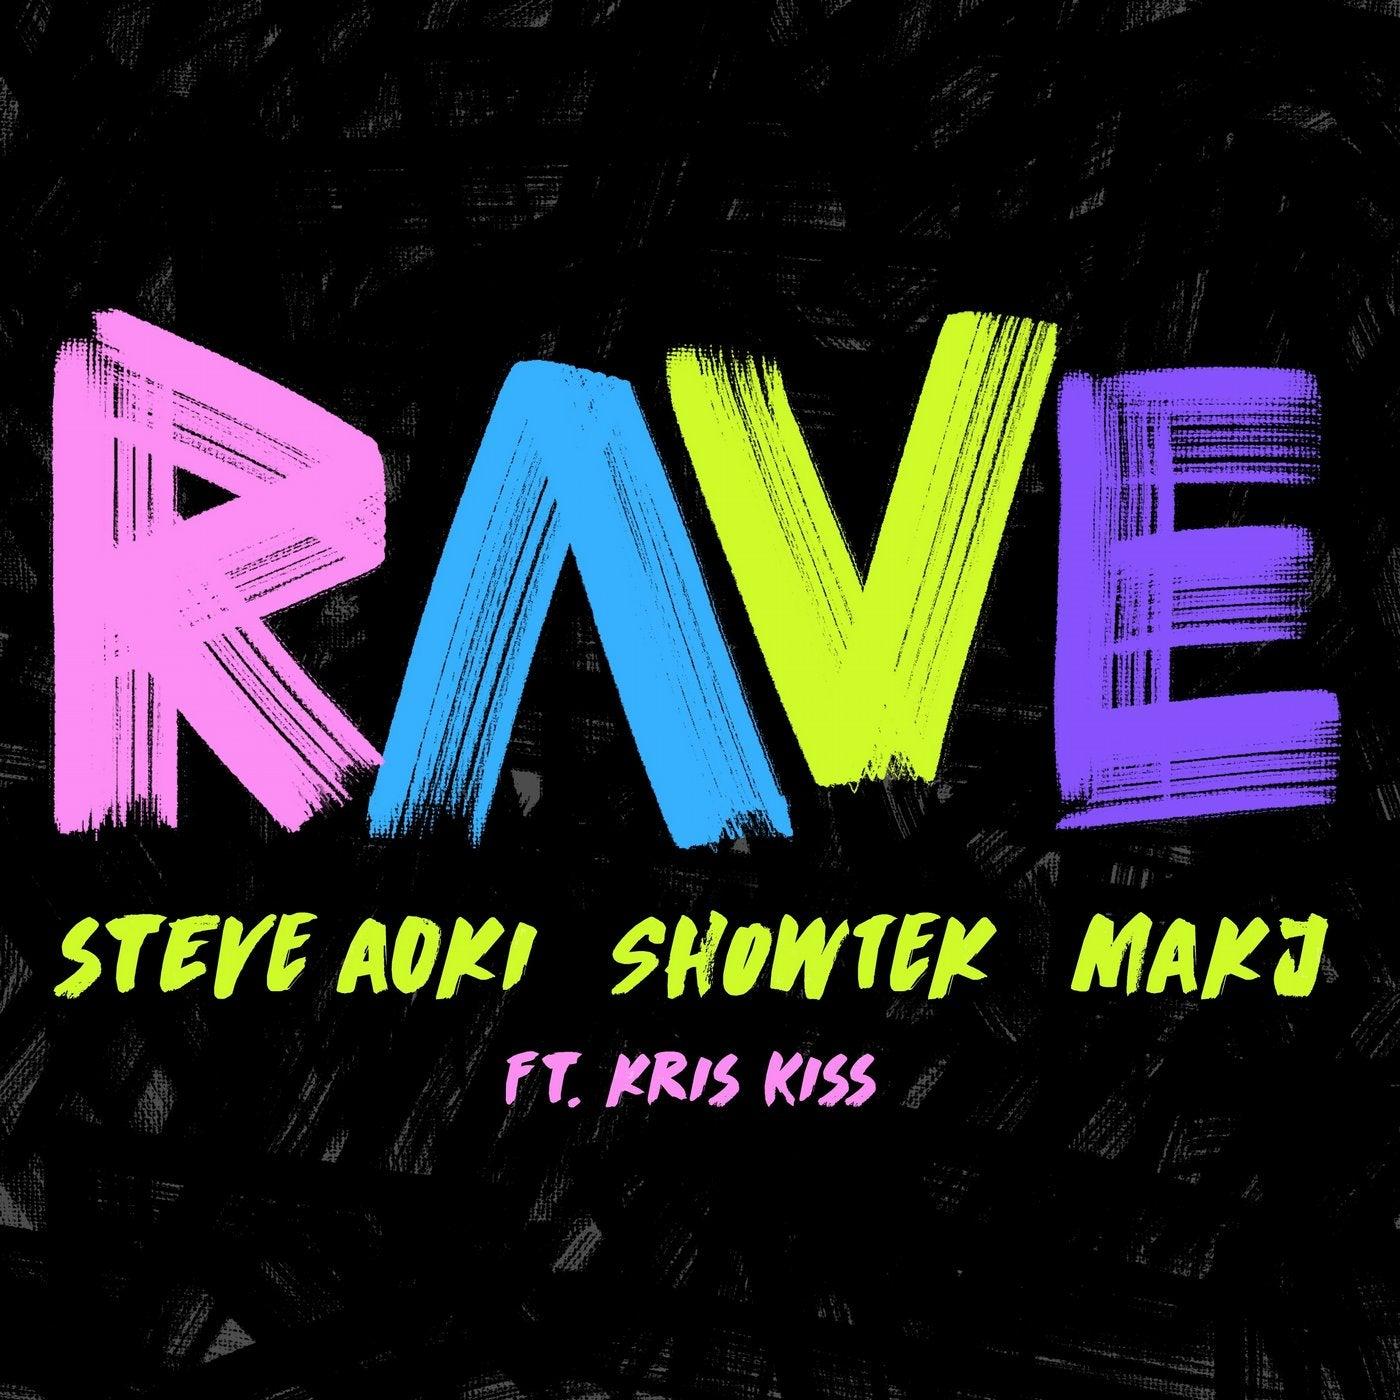 Rave feat. Kris Kiss (Extended Mix)